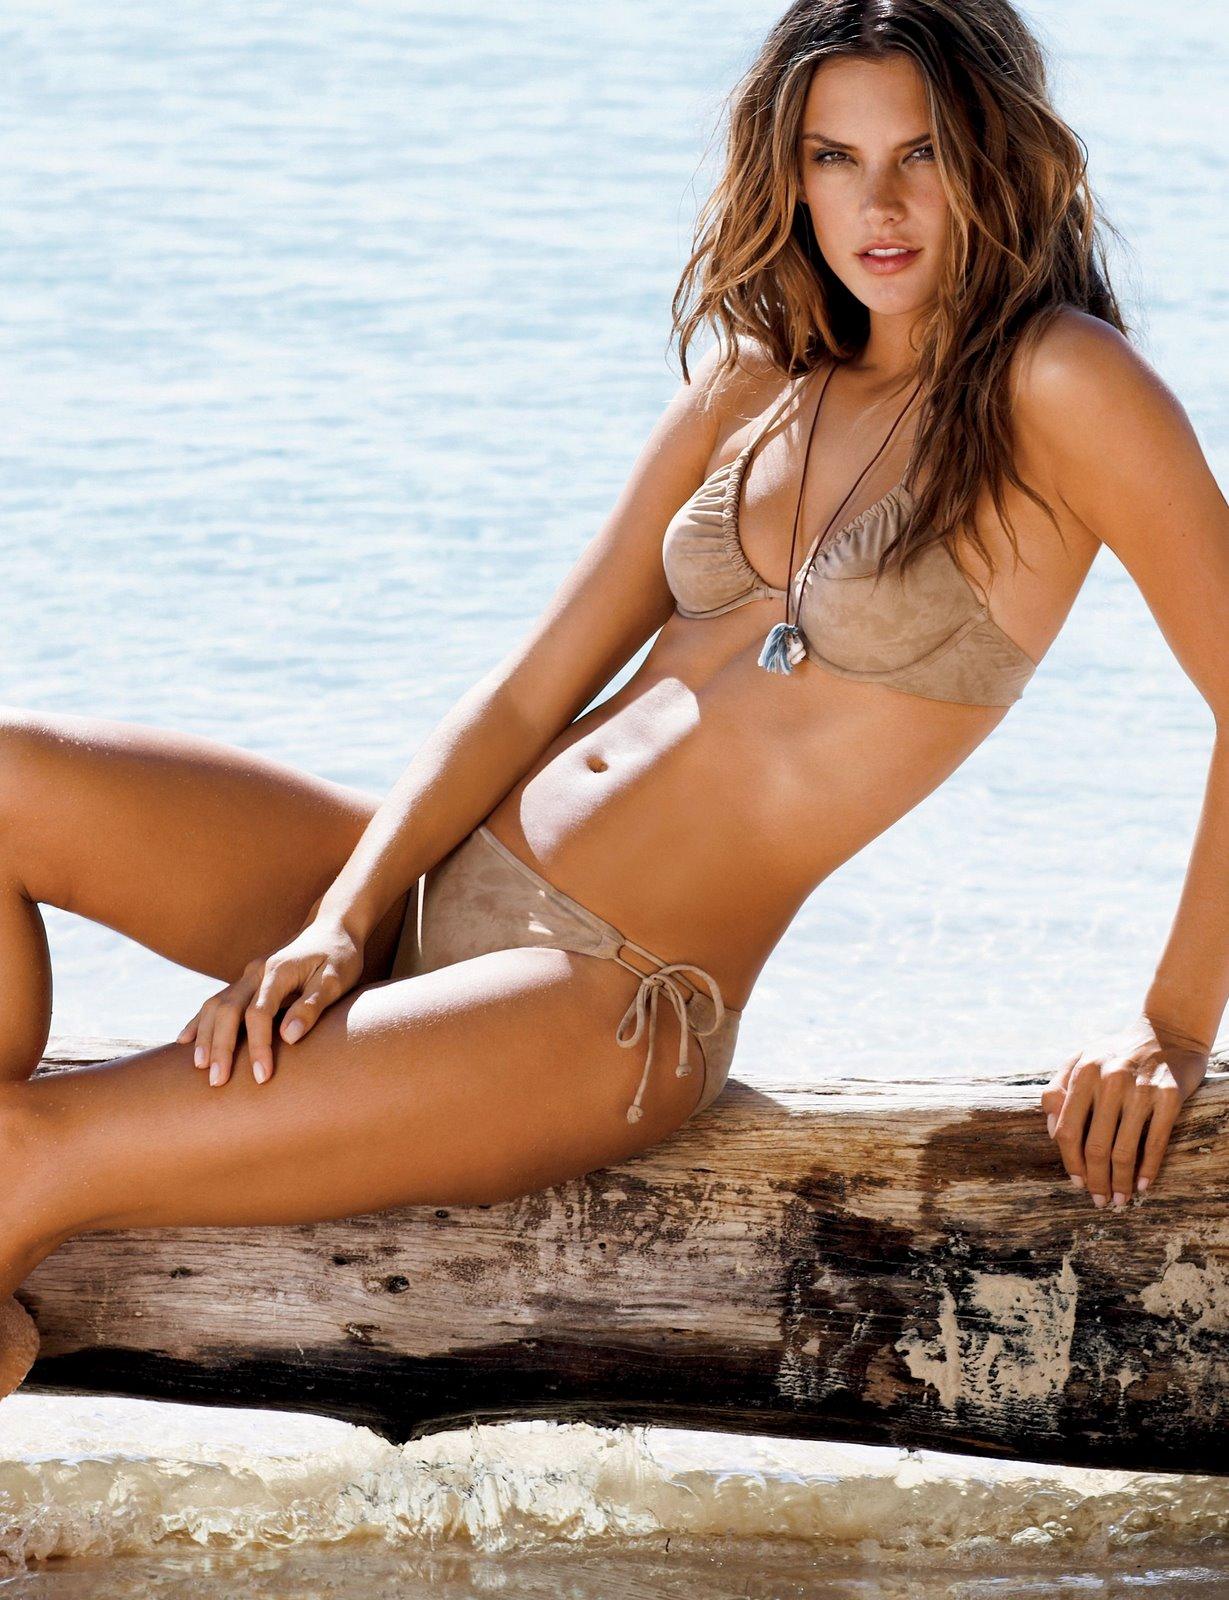 Bikini Teresa Dilger naked (35 foto and video), Pussy, Hot, Boobs, bra 2015